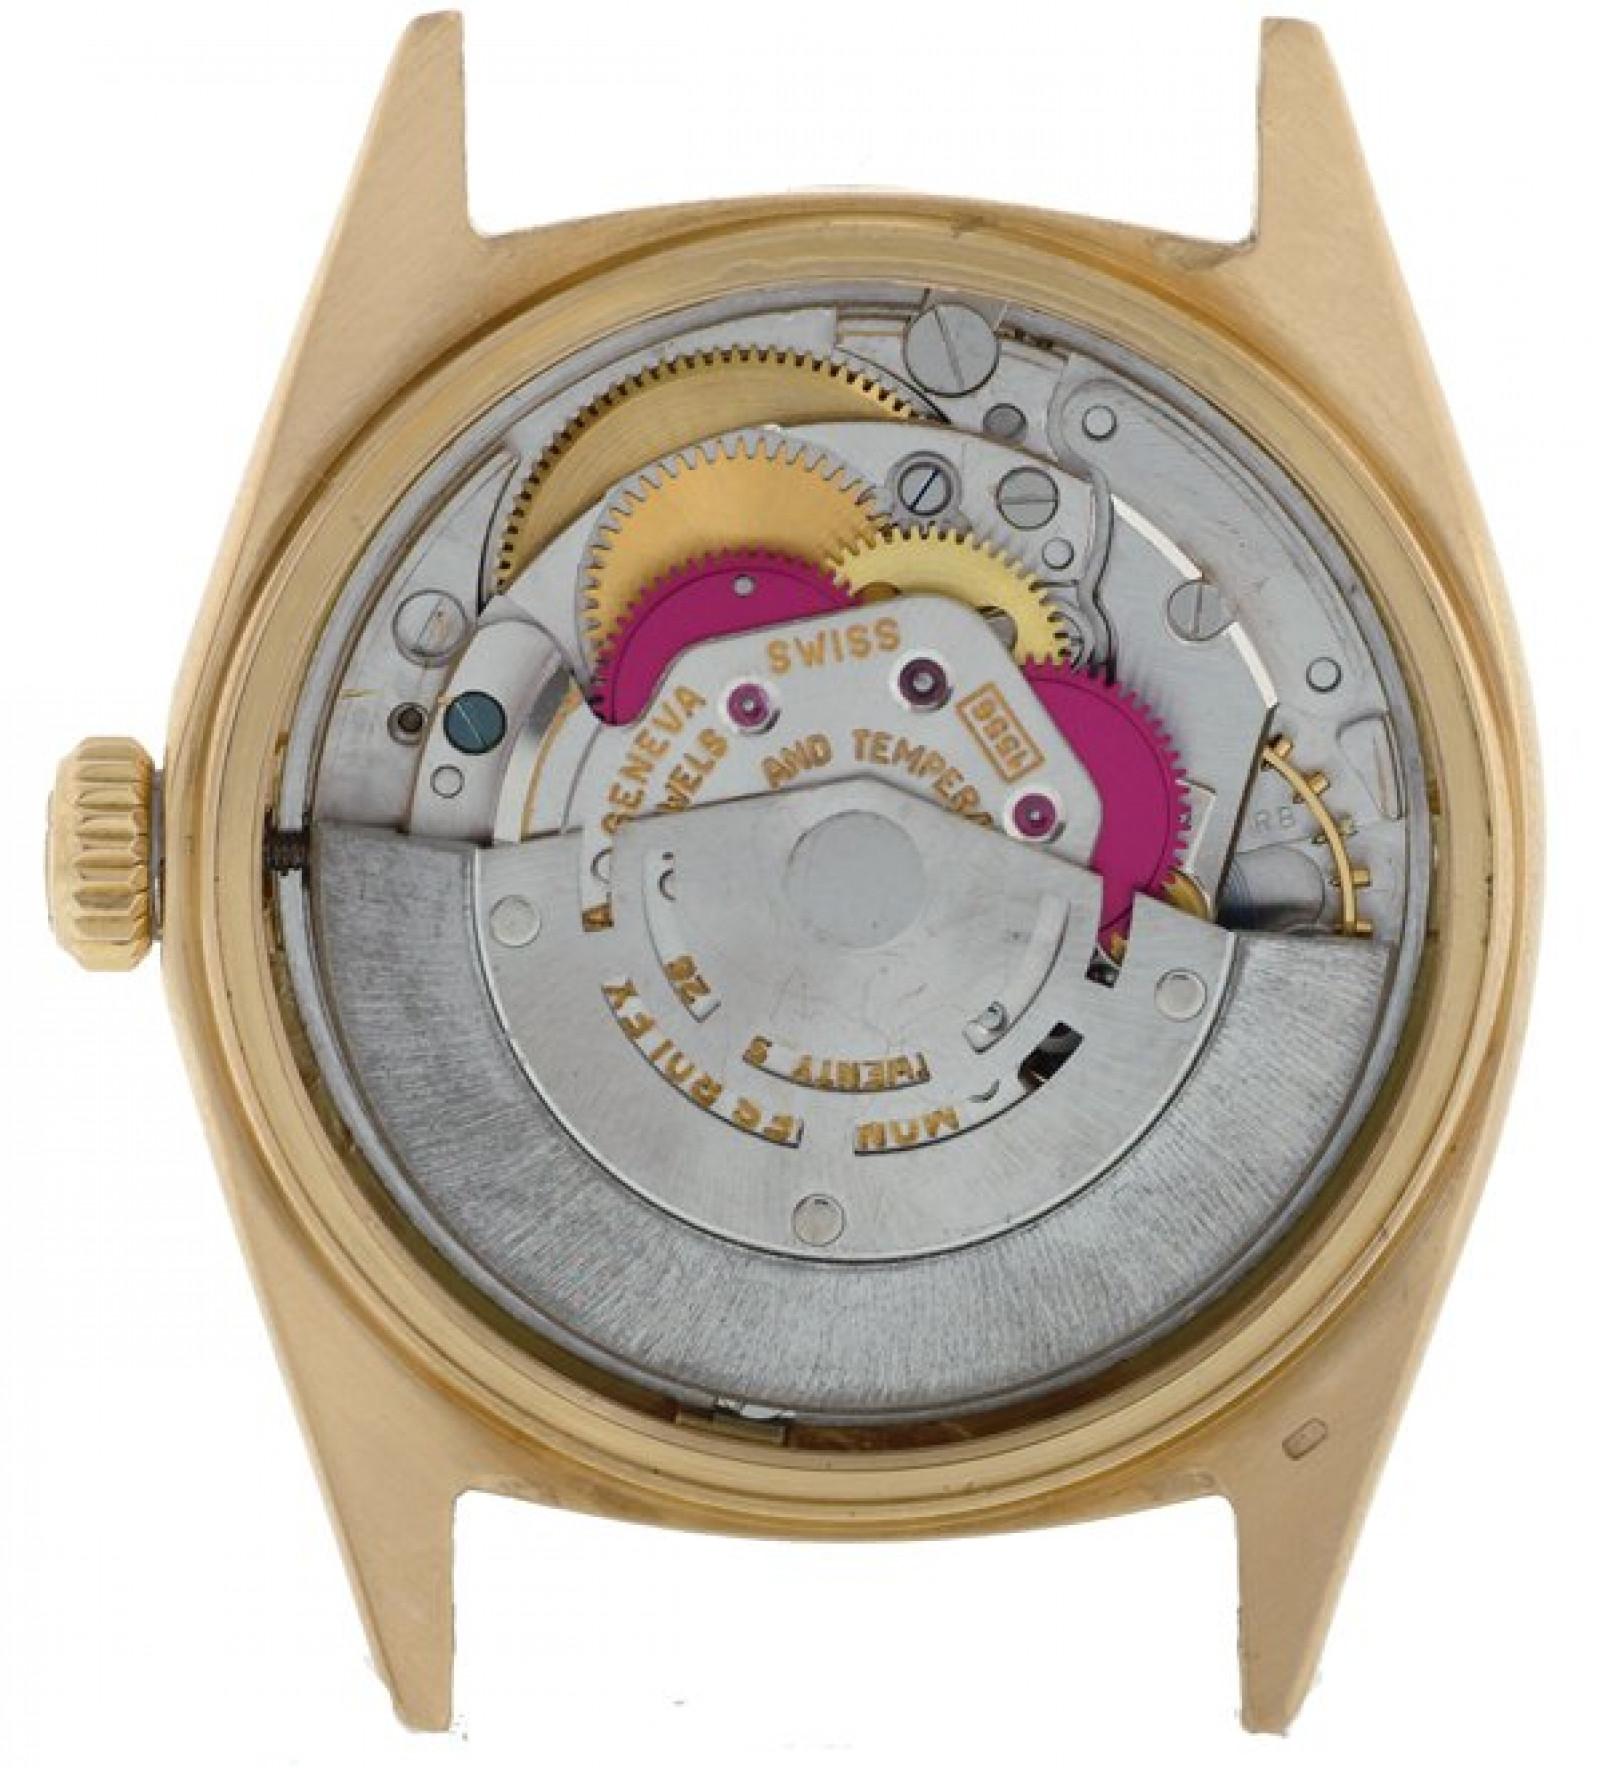 Vintage Rolex Day-Date 1803 Gold Year 1966 1966